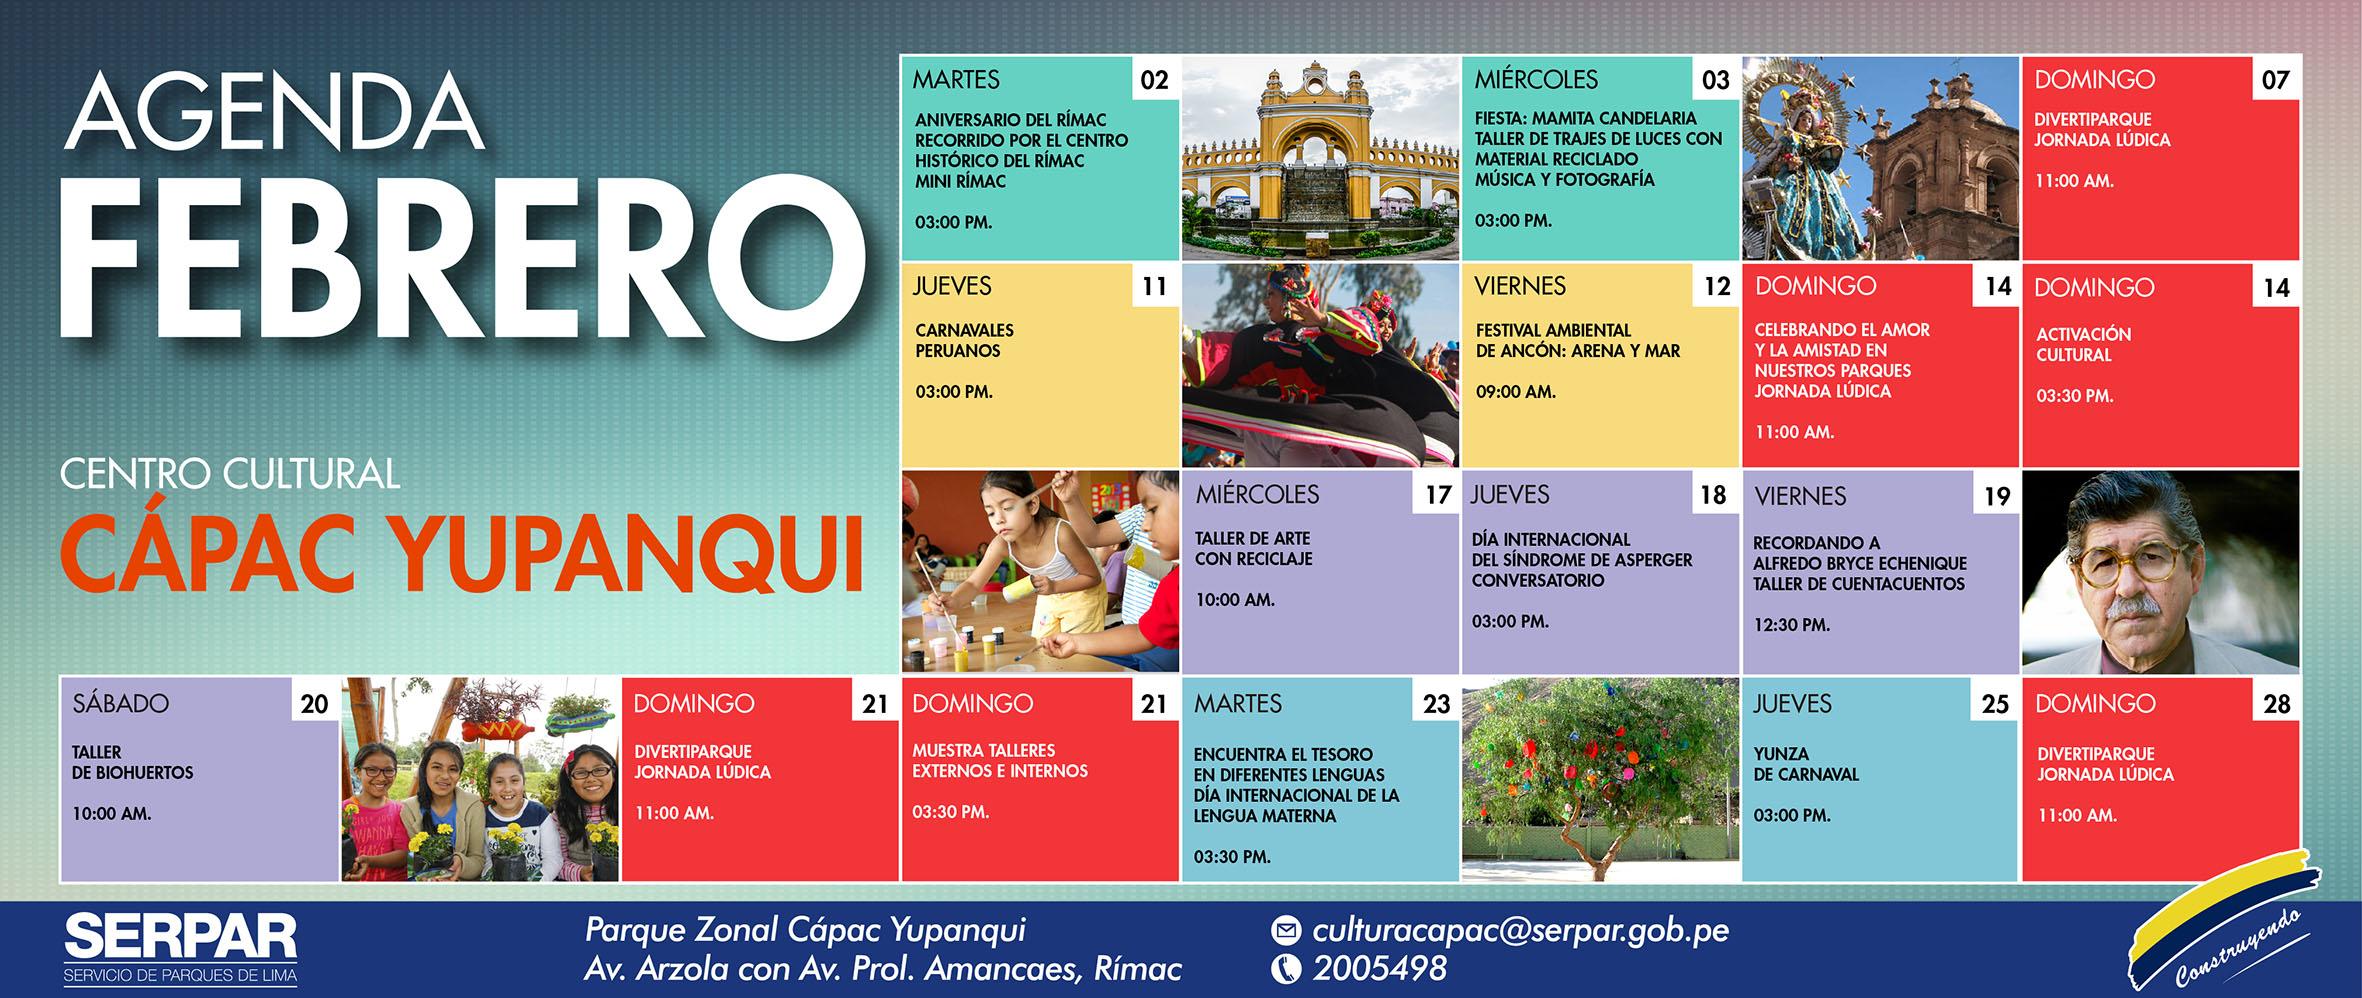 web_agenda_cultura_FEBRERO-03